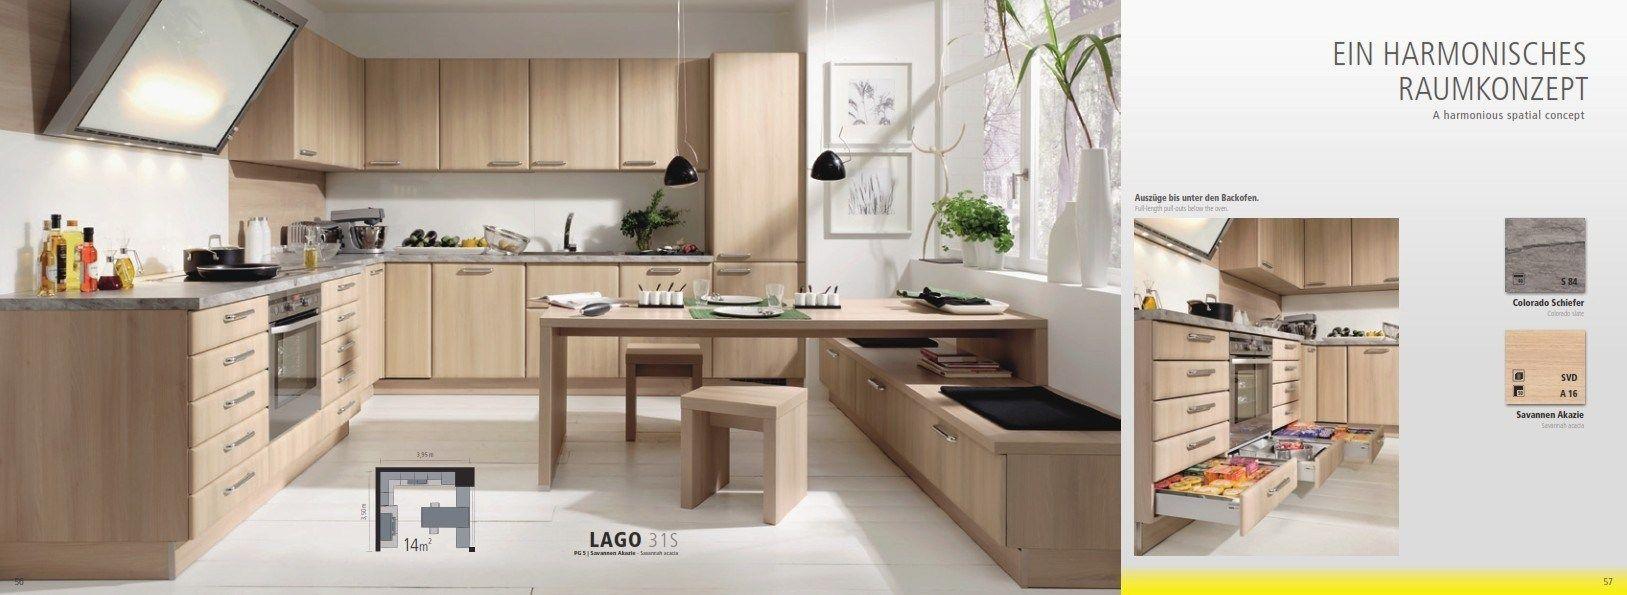 Kuchen Kataloge 2018 Beliebtesten Ikea Kuche Bildergalerie Interer